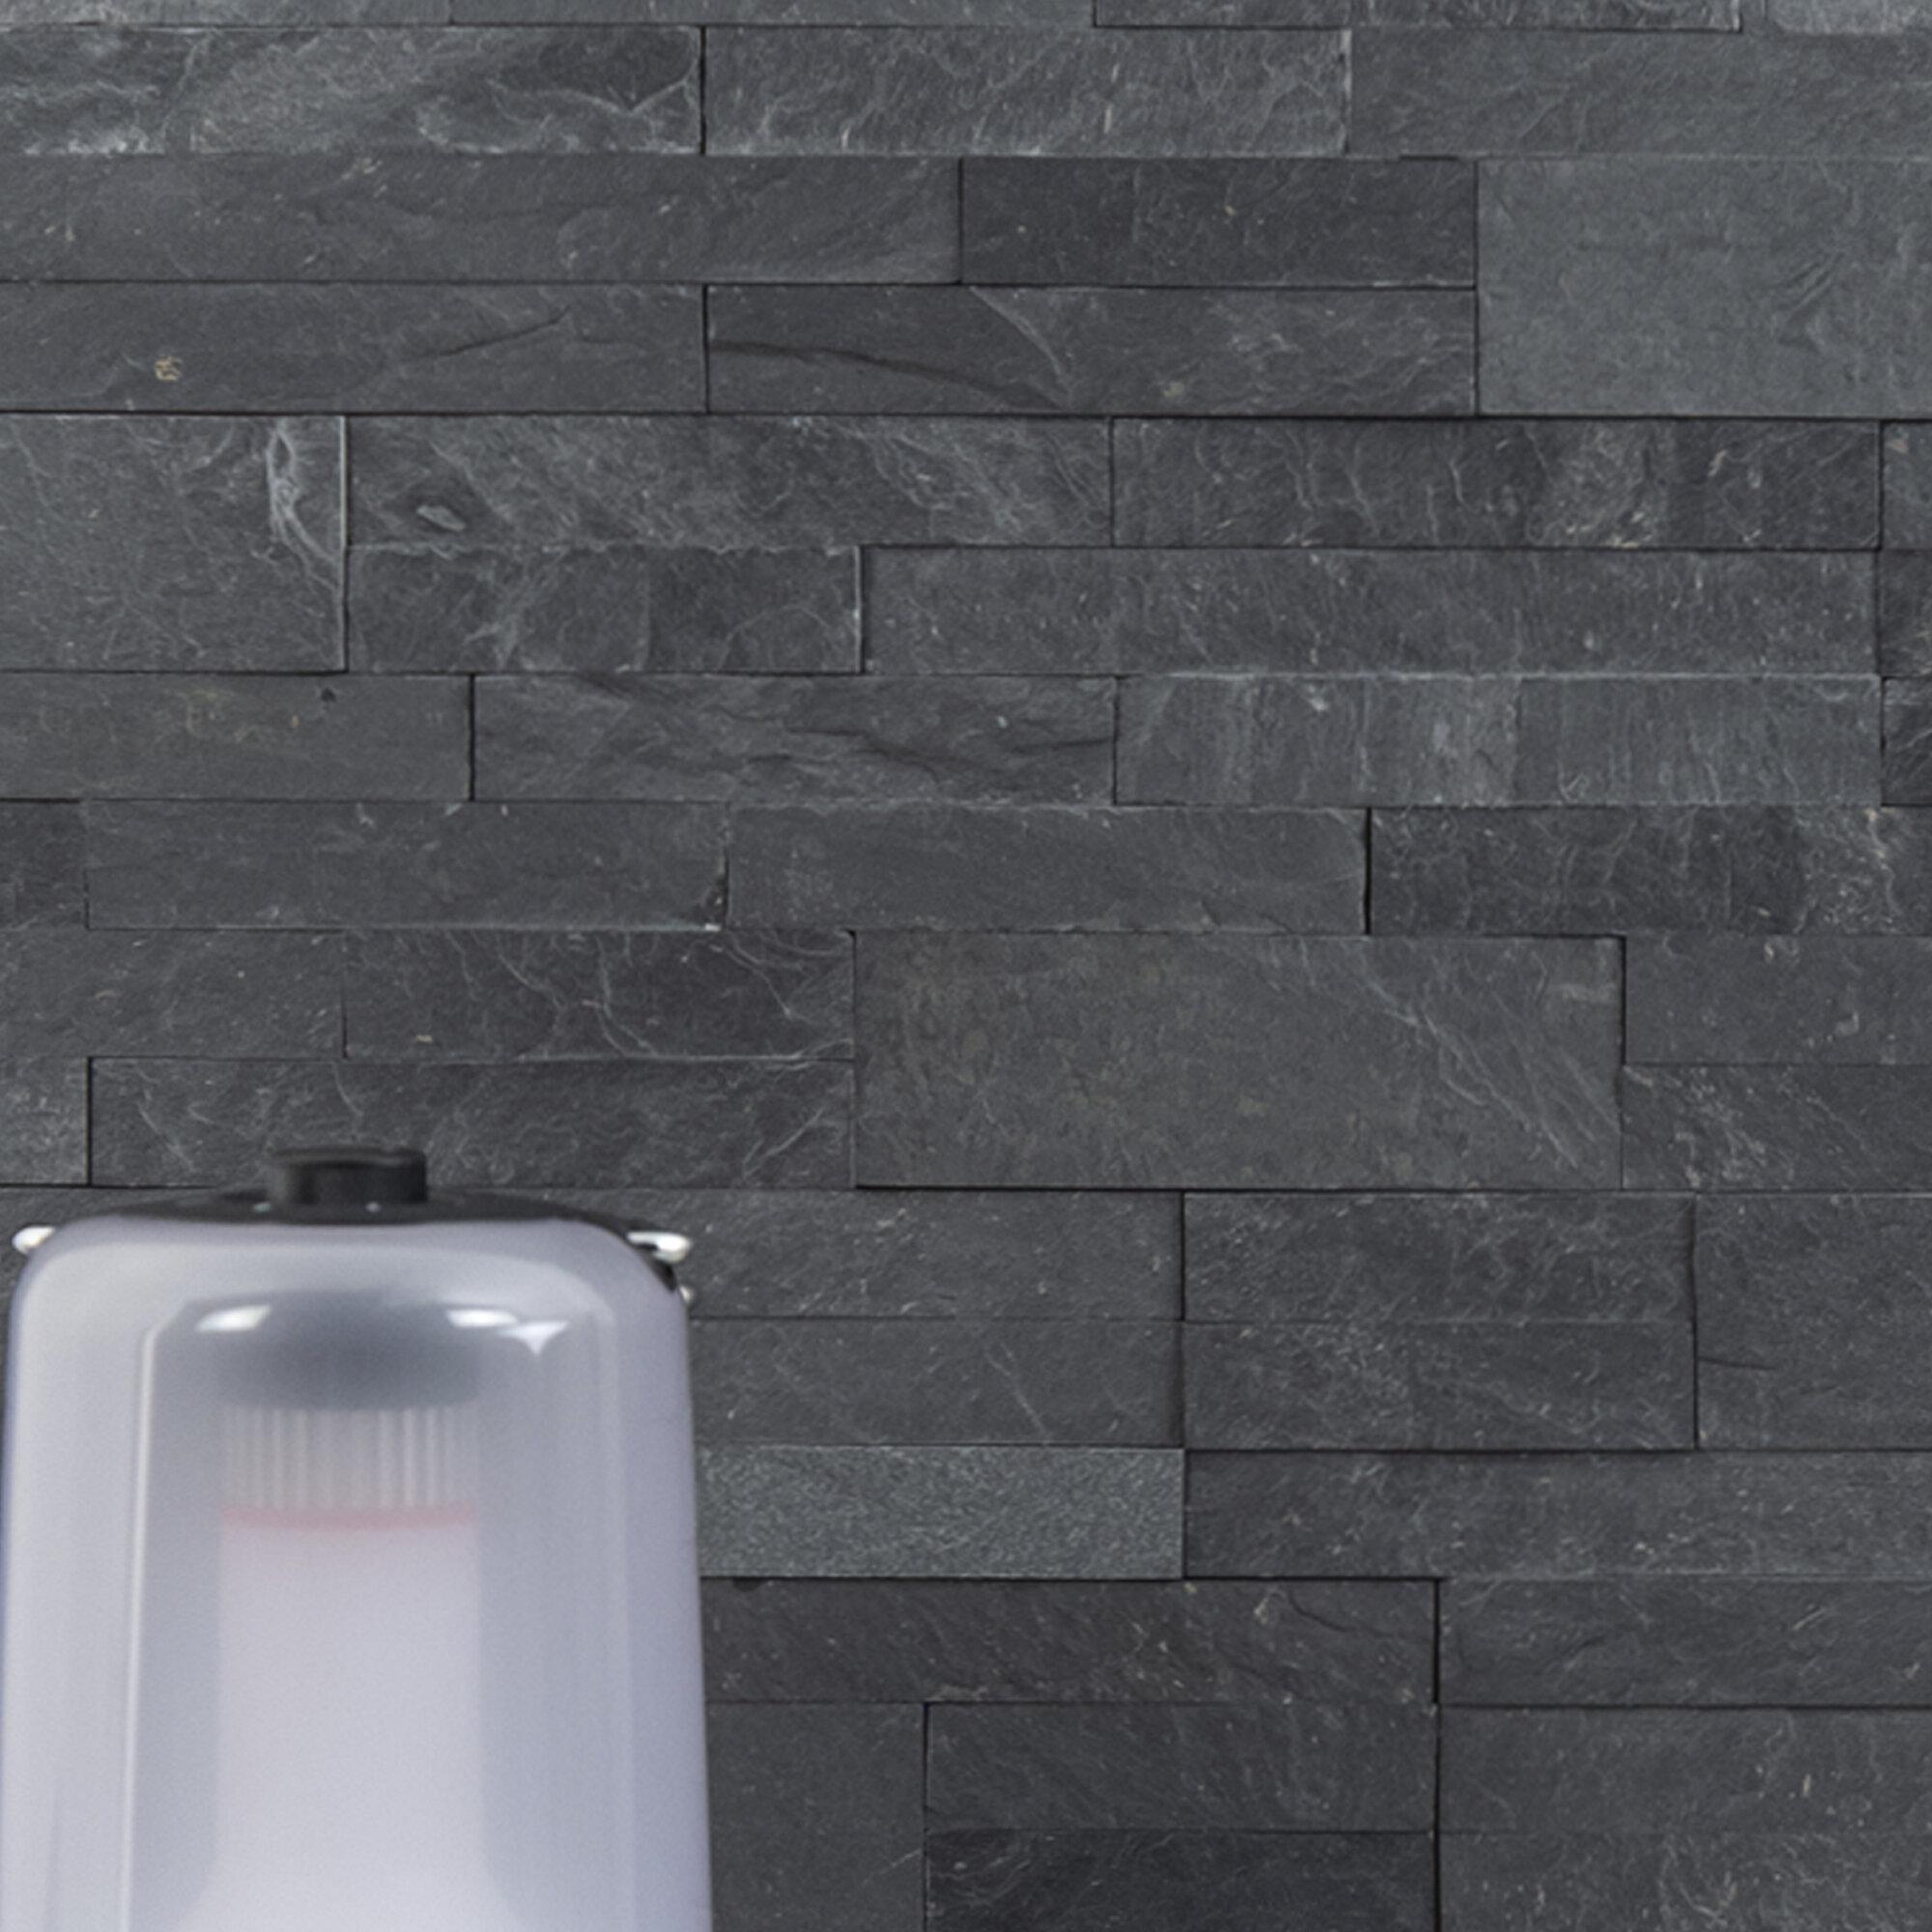 Peel /& Impress Peel/&Impress Self Adhesive backsplash Tile 11.25 X 10-4 Pack Dark Sky Marble Oblong 4 Count